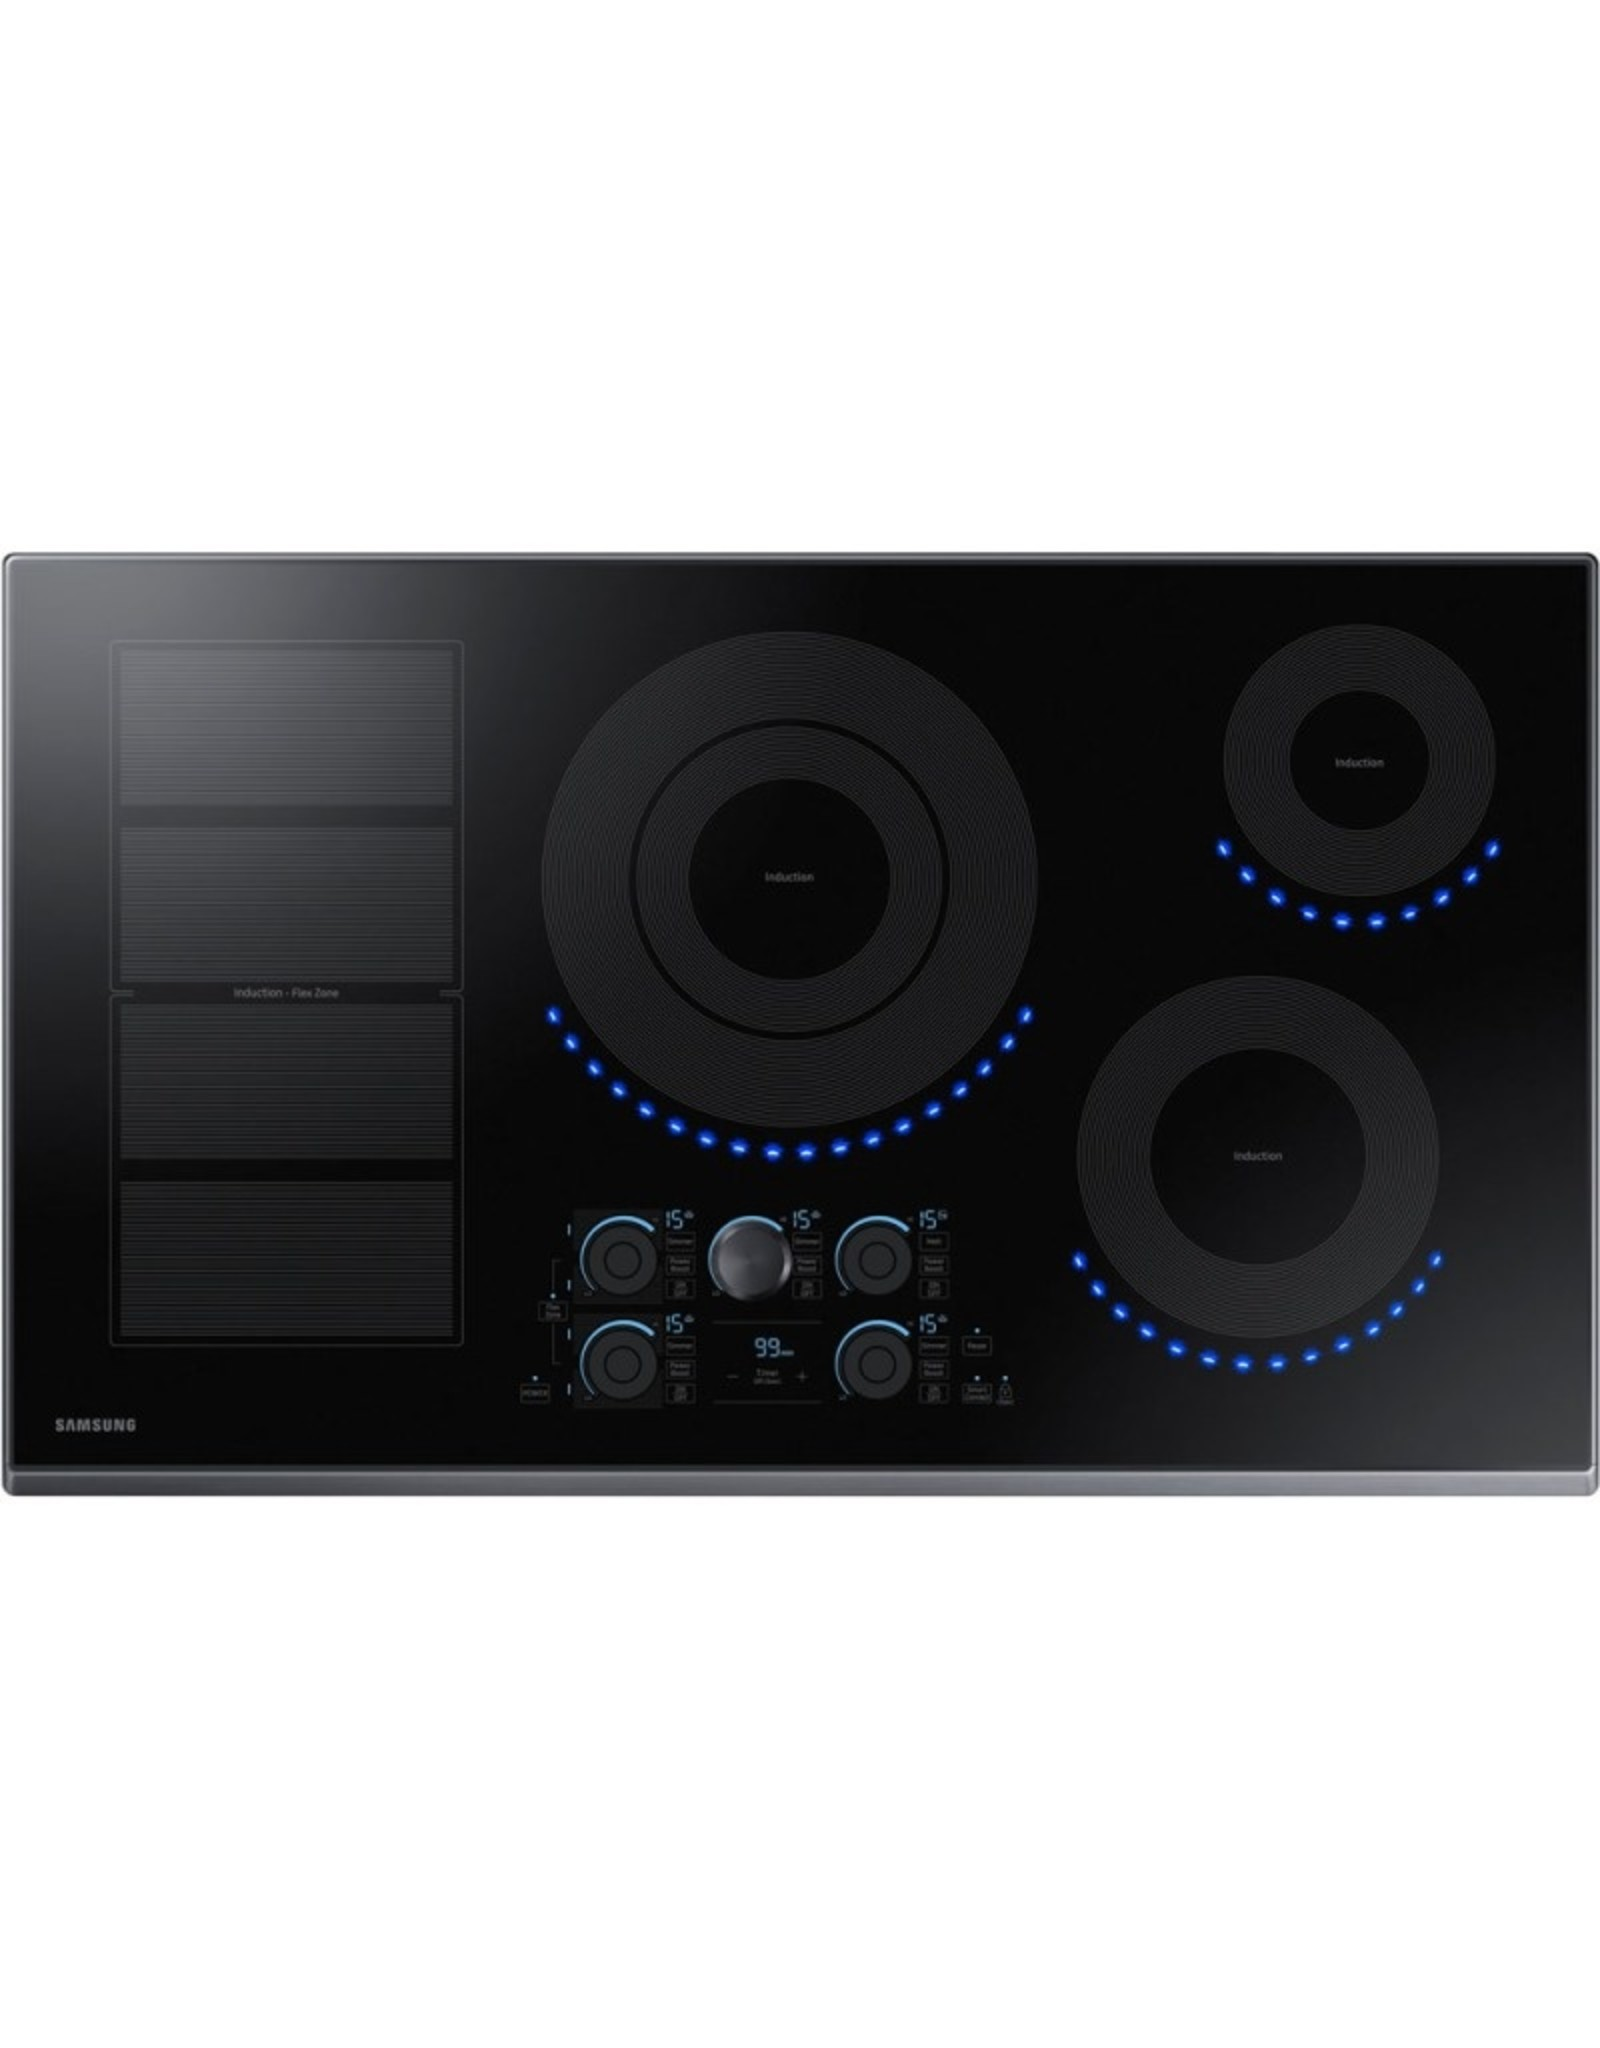 "SAMSUNG NZ36K7880UG Samsung 36"" Induction Cooktop, Flex Zone, 1-7"",11"" Dual 4.8K Boost, 1-8"